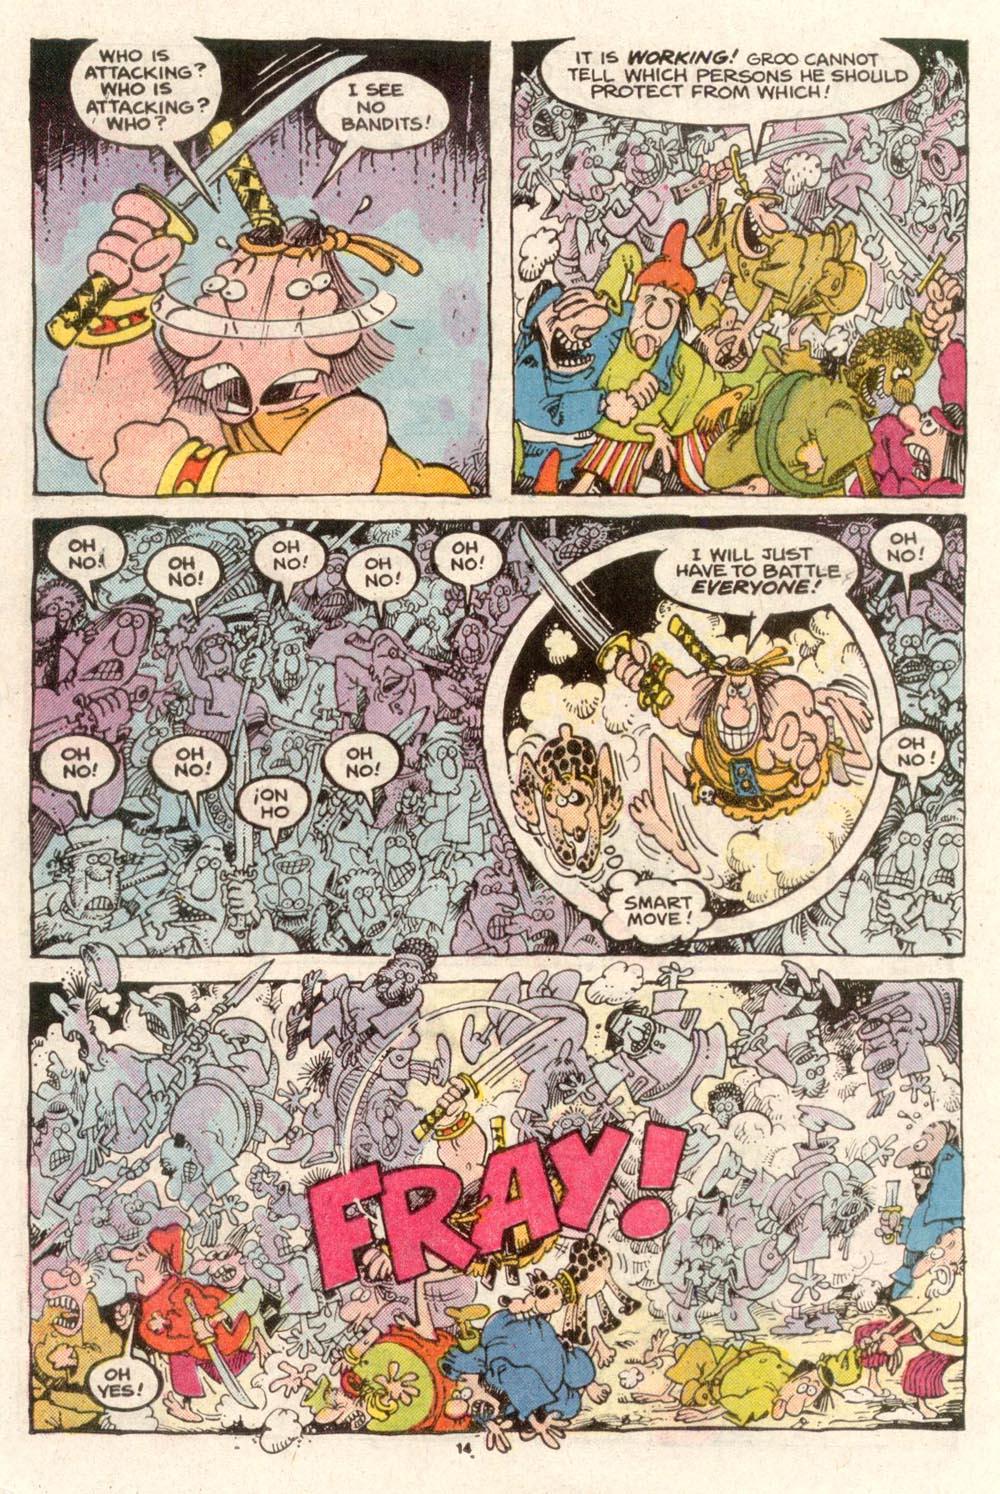 Read online Sergio Aragonés Groo the Wanderer comic -  Issue #49 - 14